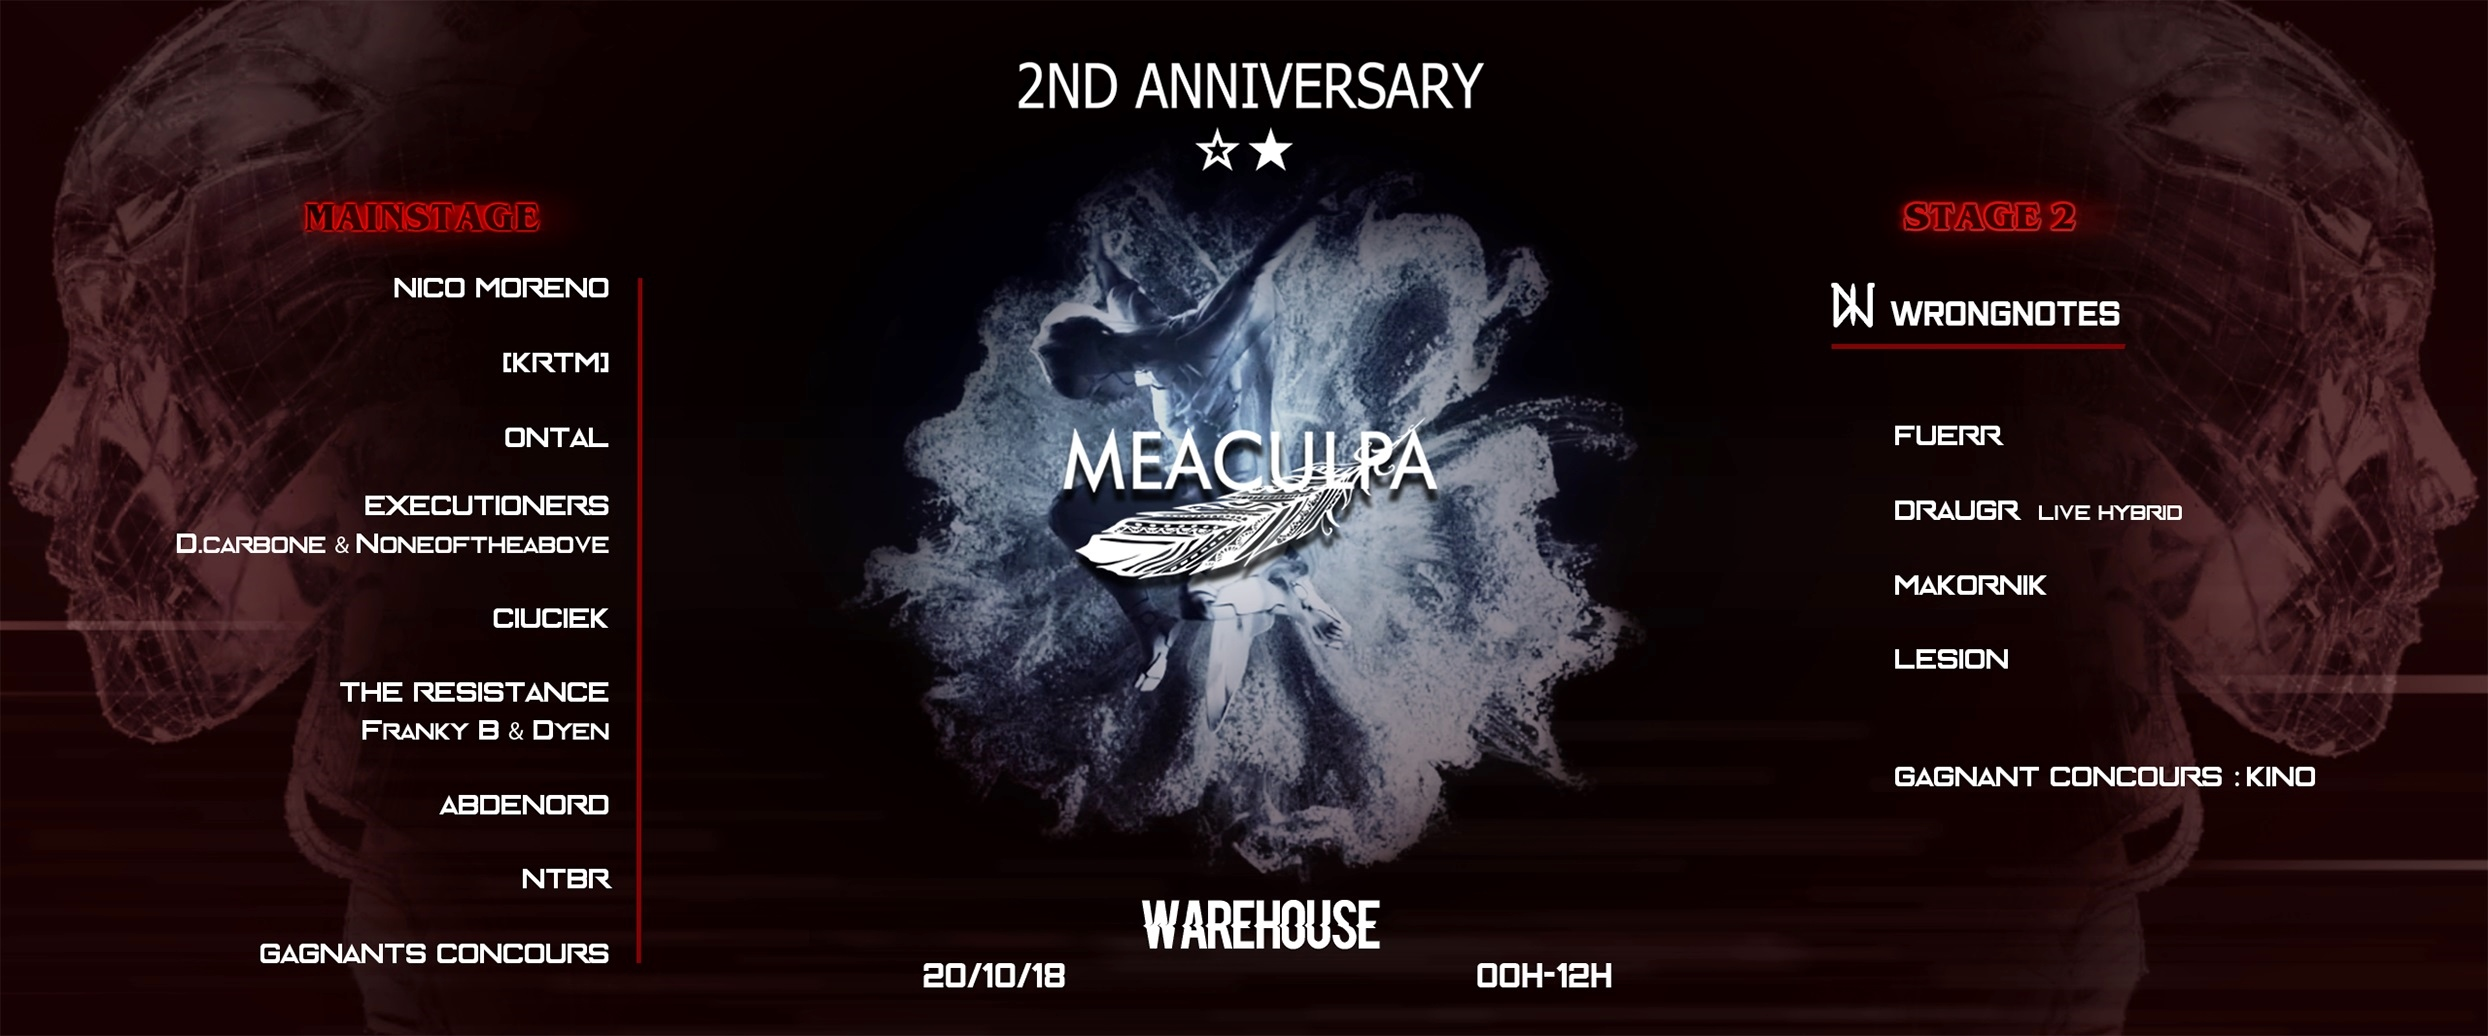 Meaculpa // 2nd Anniversary ☆★